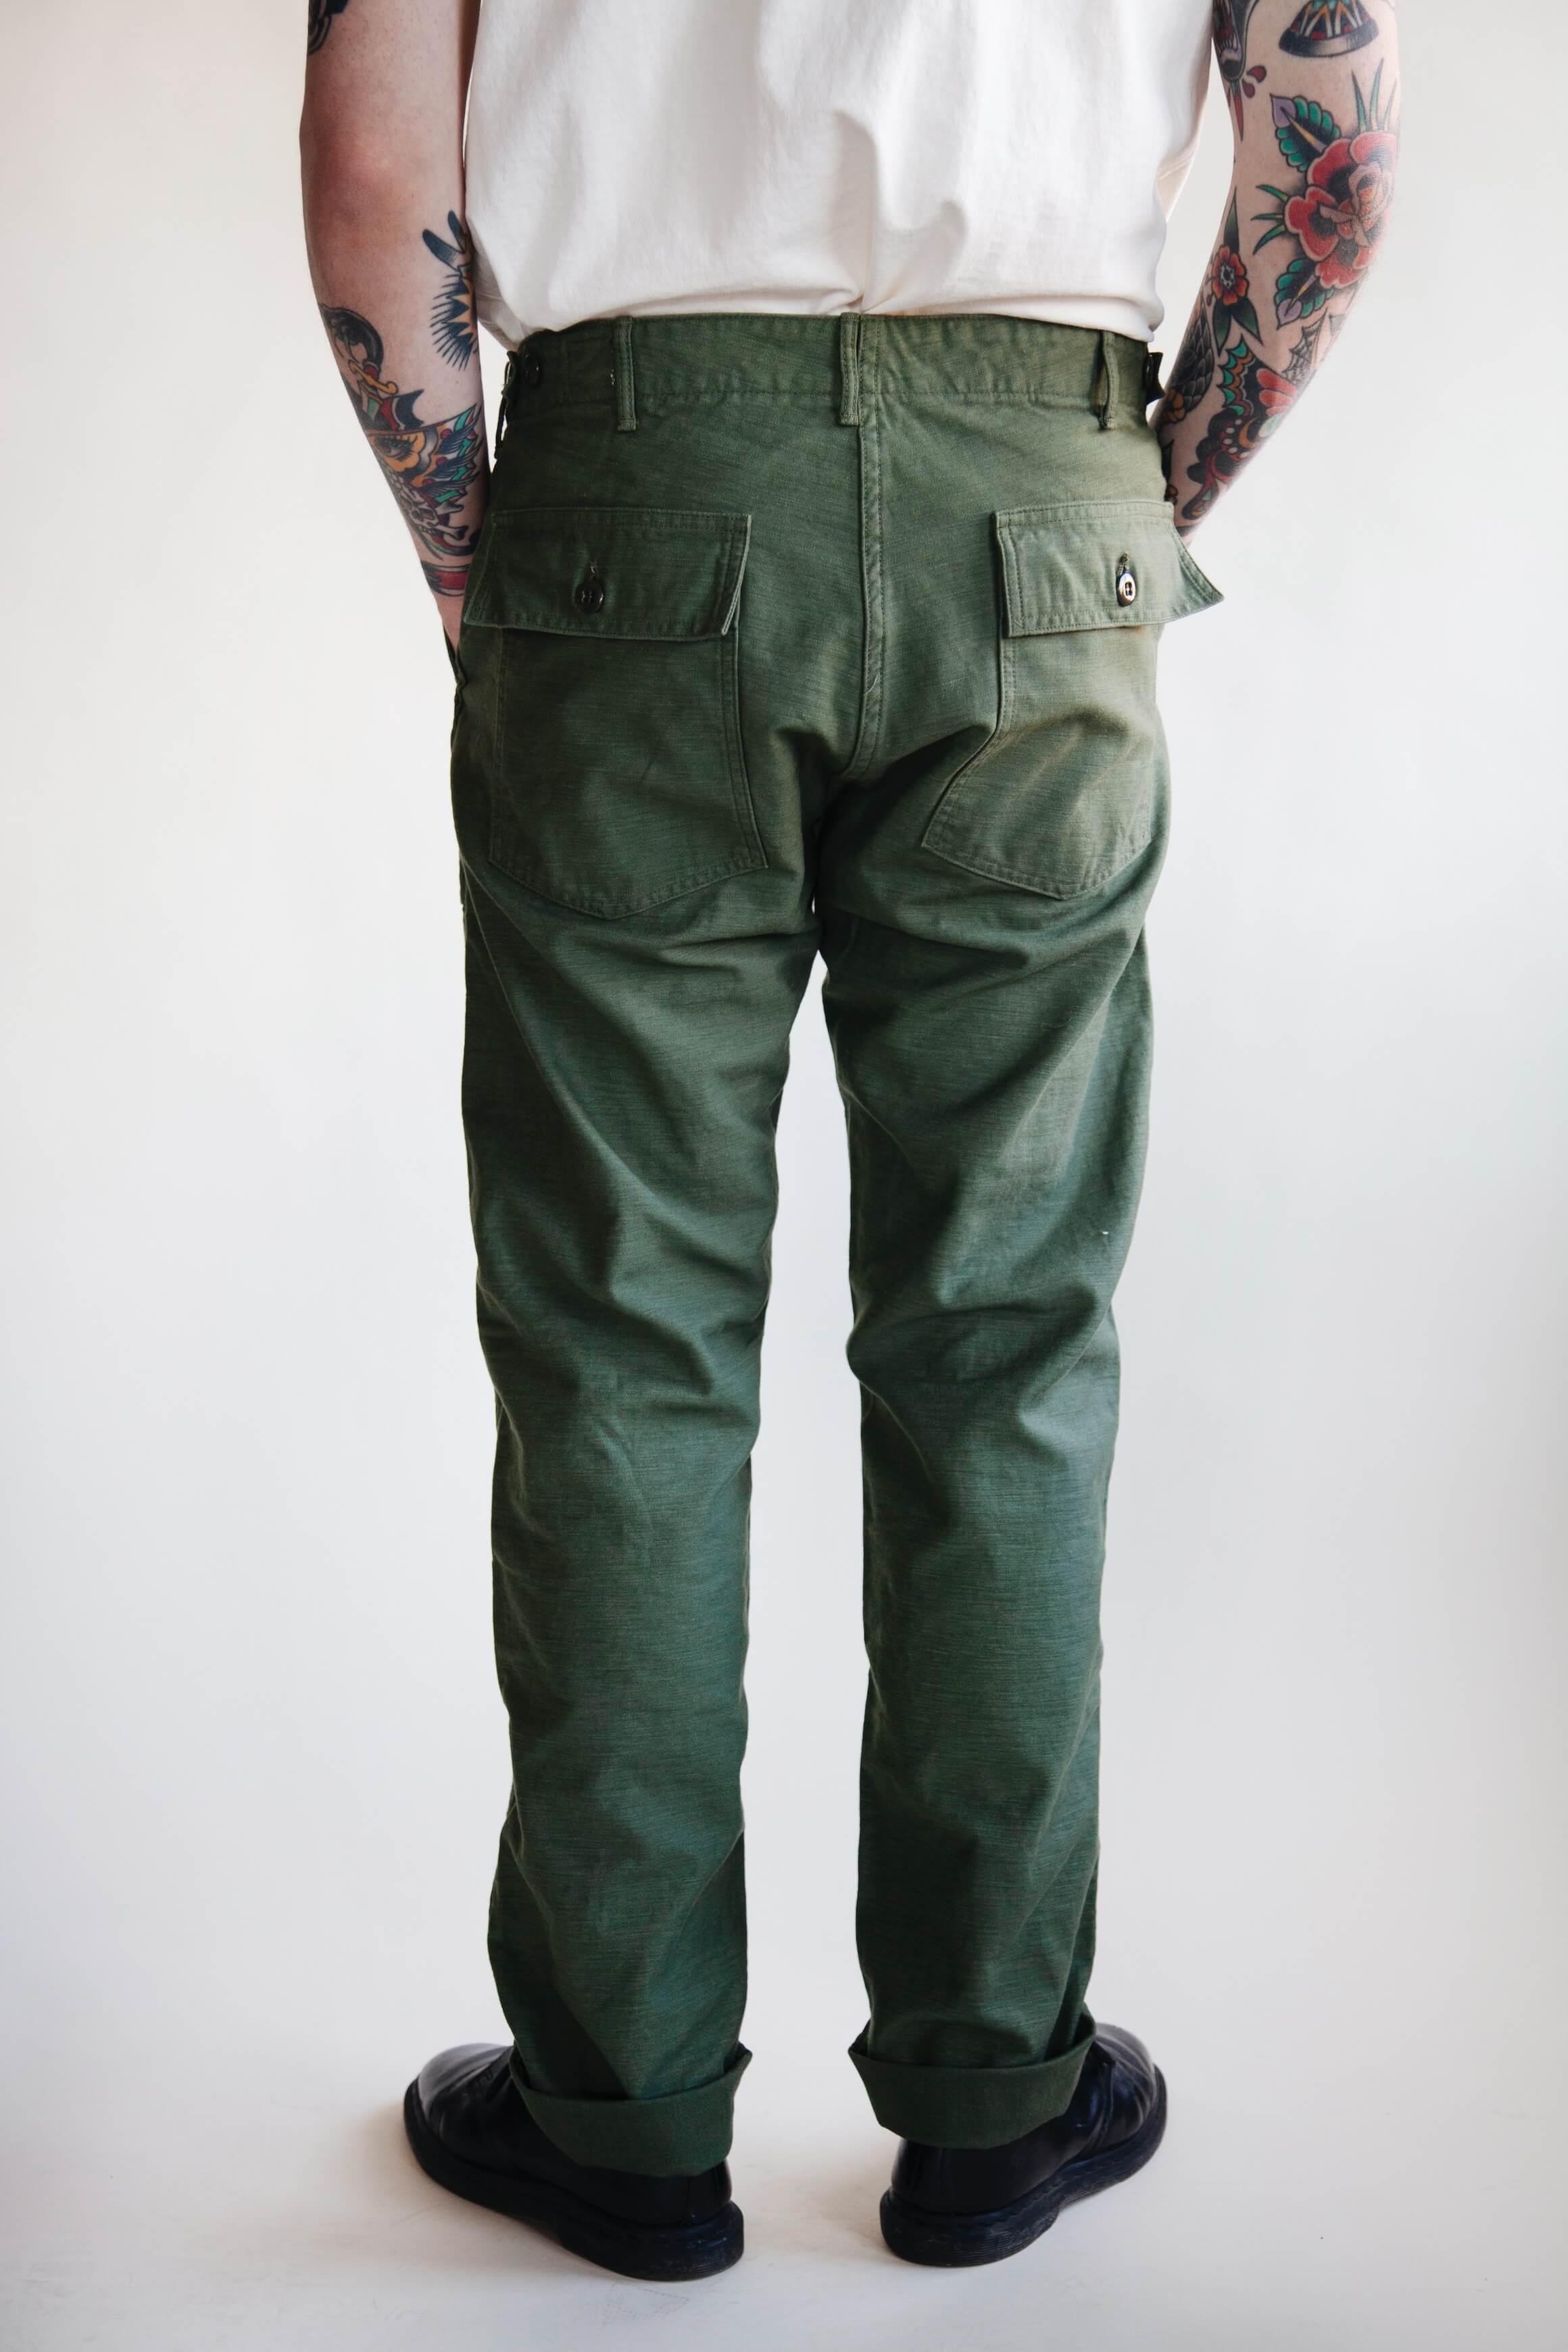 orslow Slim Fit Fatigue Pants - Olive Reverse Sateen on male model